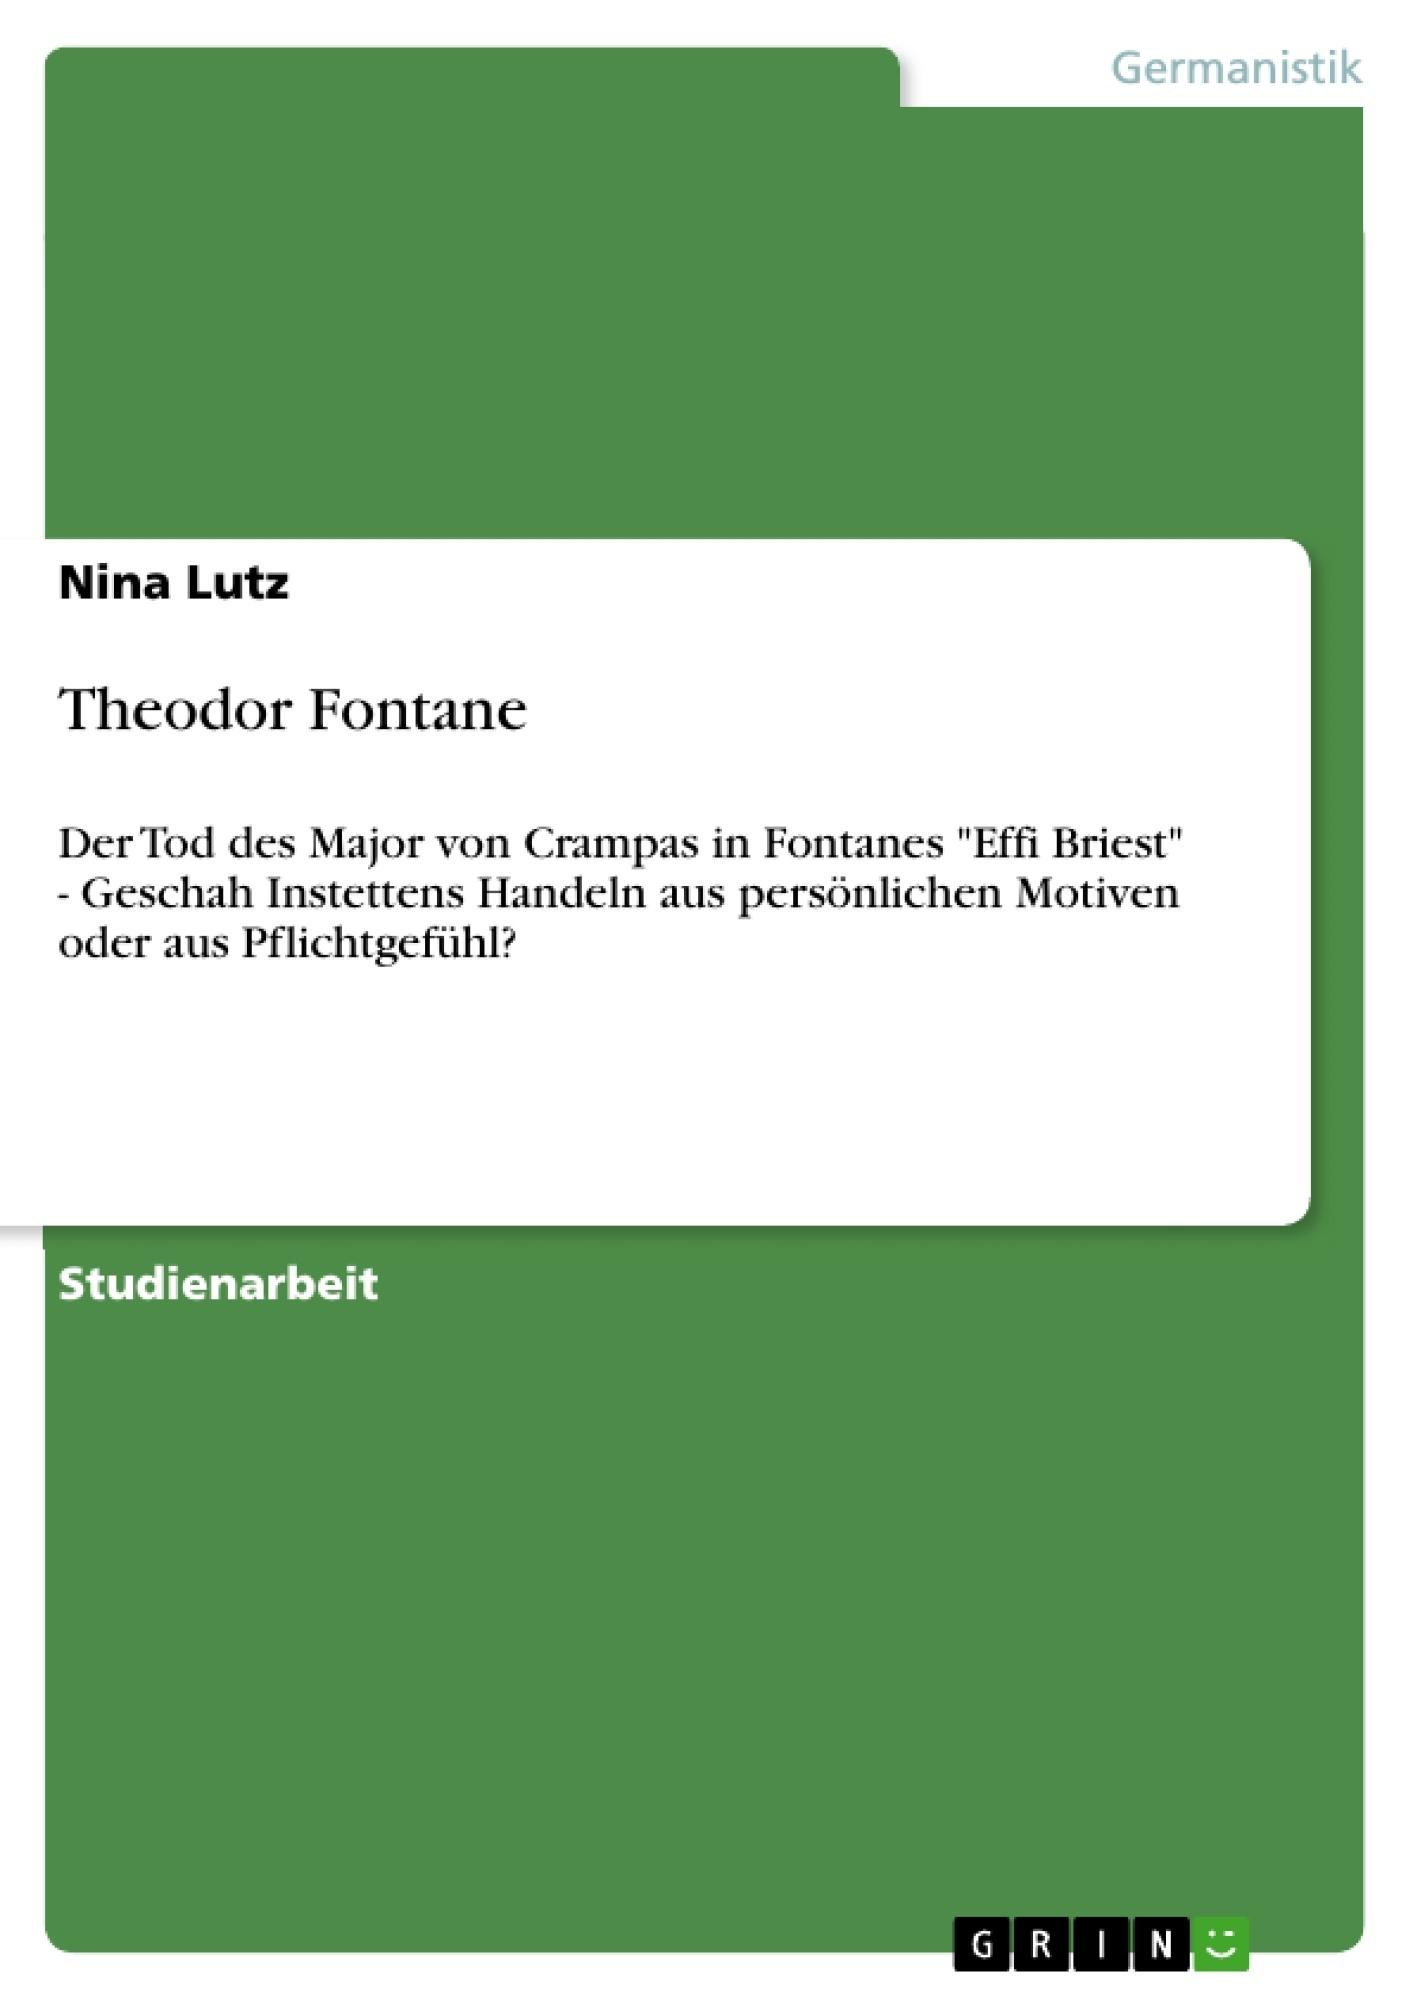 Titel: Theodor Fontane